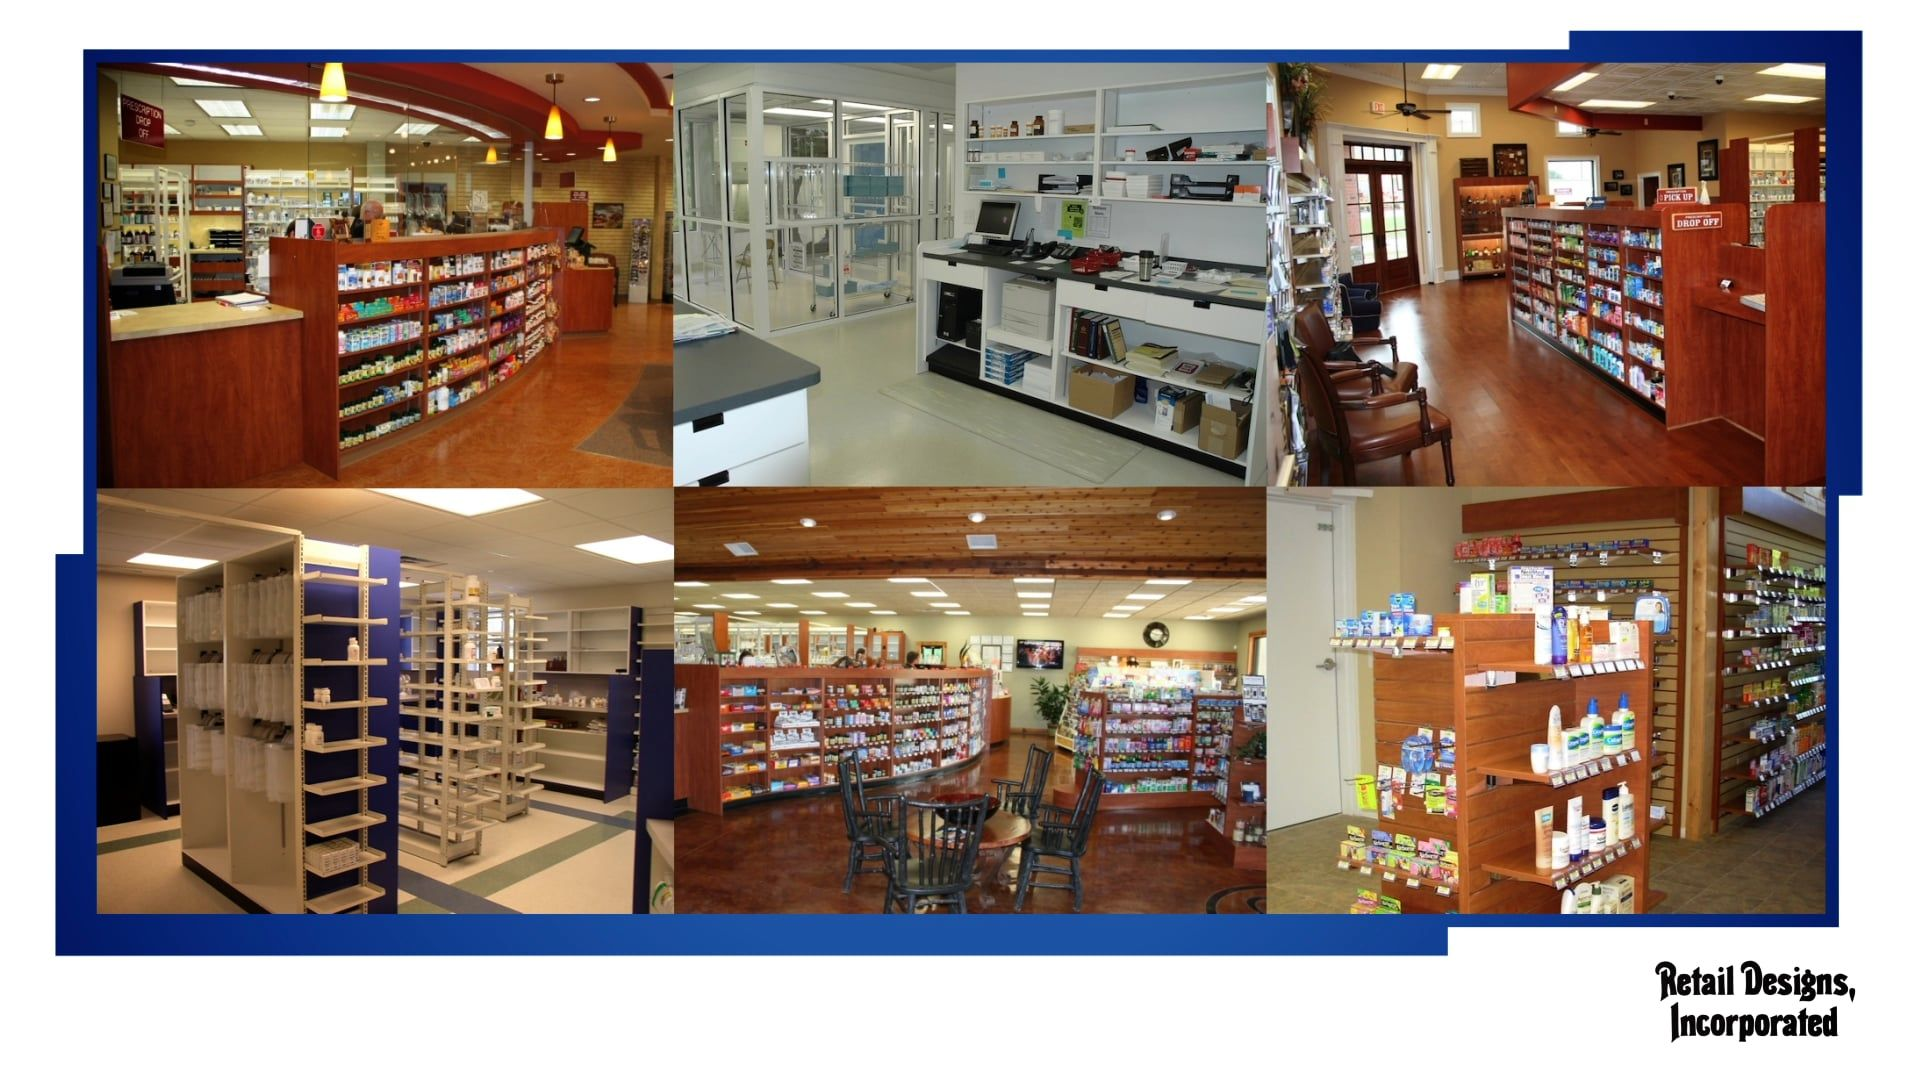 Retail Designs, Inc. Modular Pharmacy Systems 2017